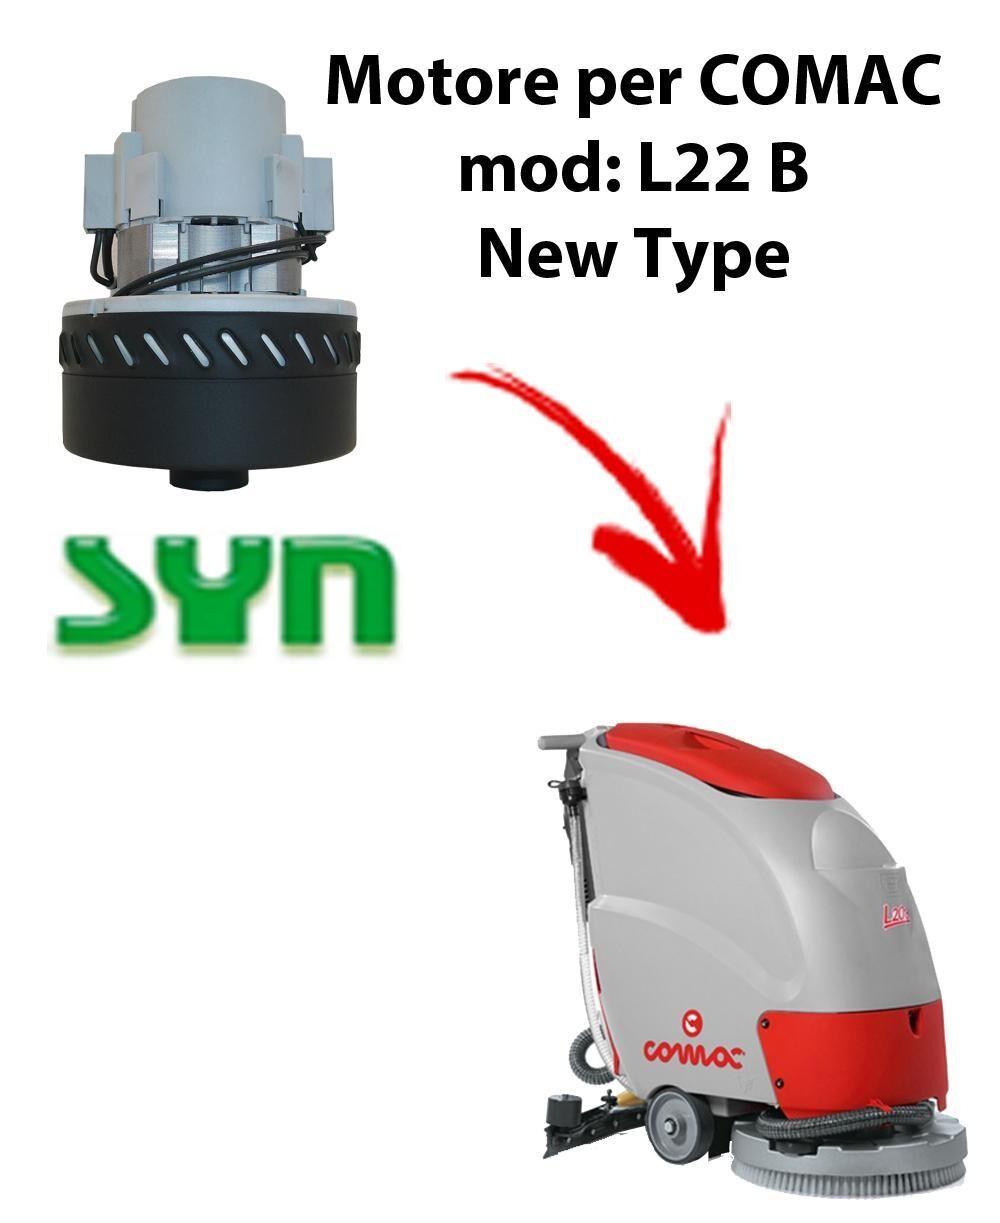 comac l22 b new type motore aspirazione syn per lavapavimenti